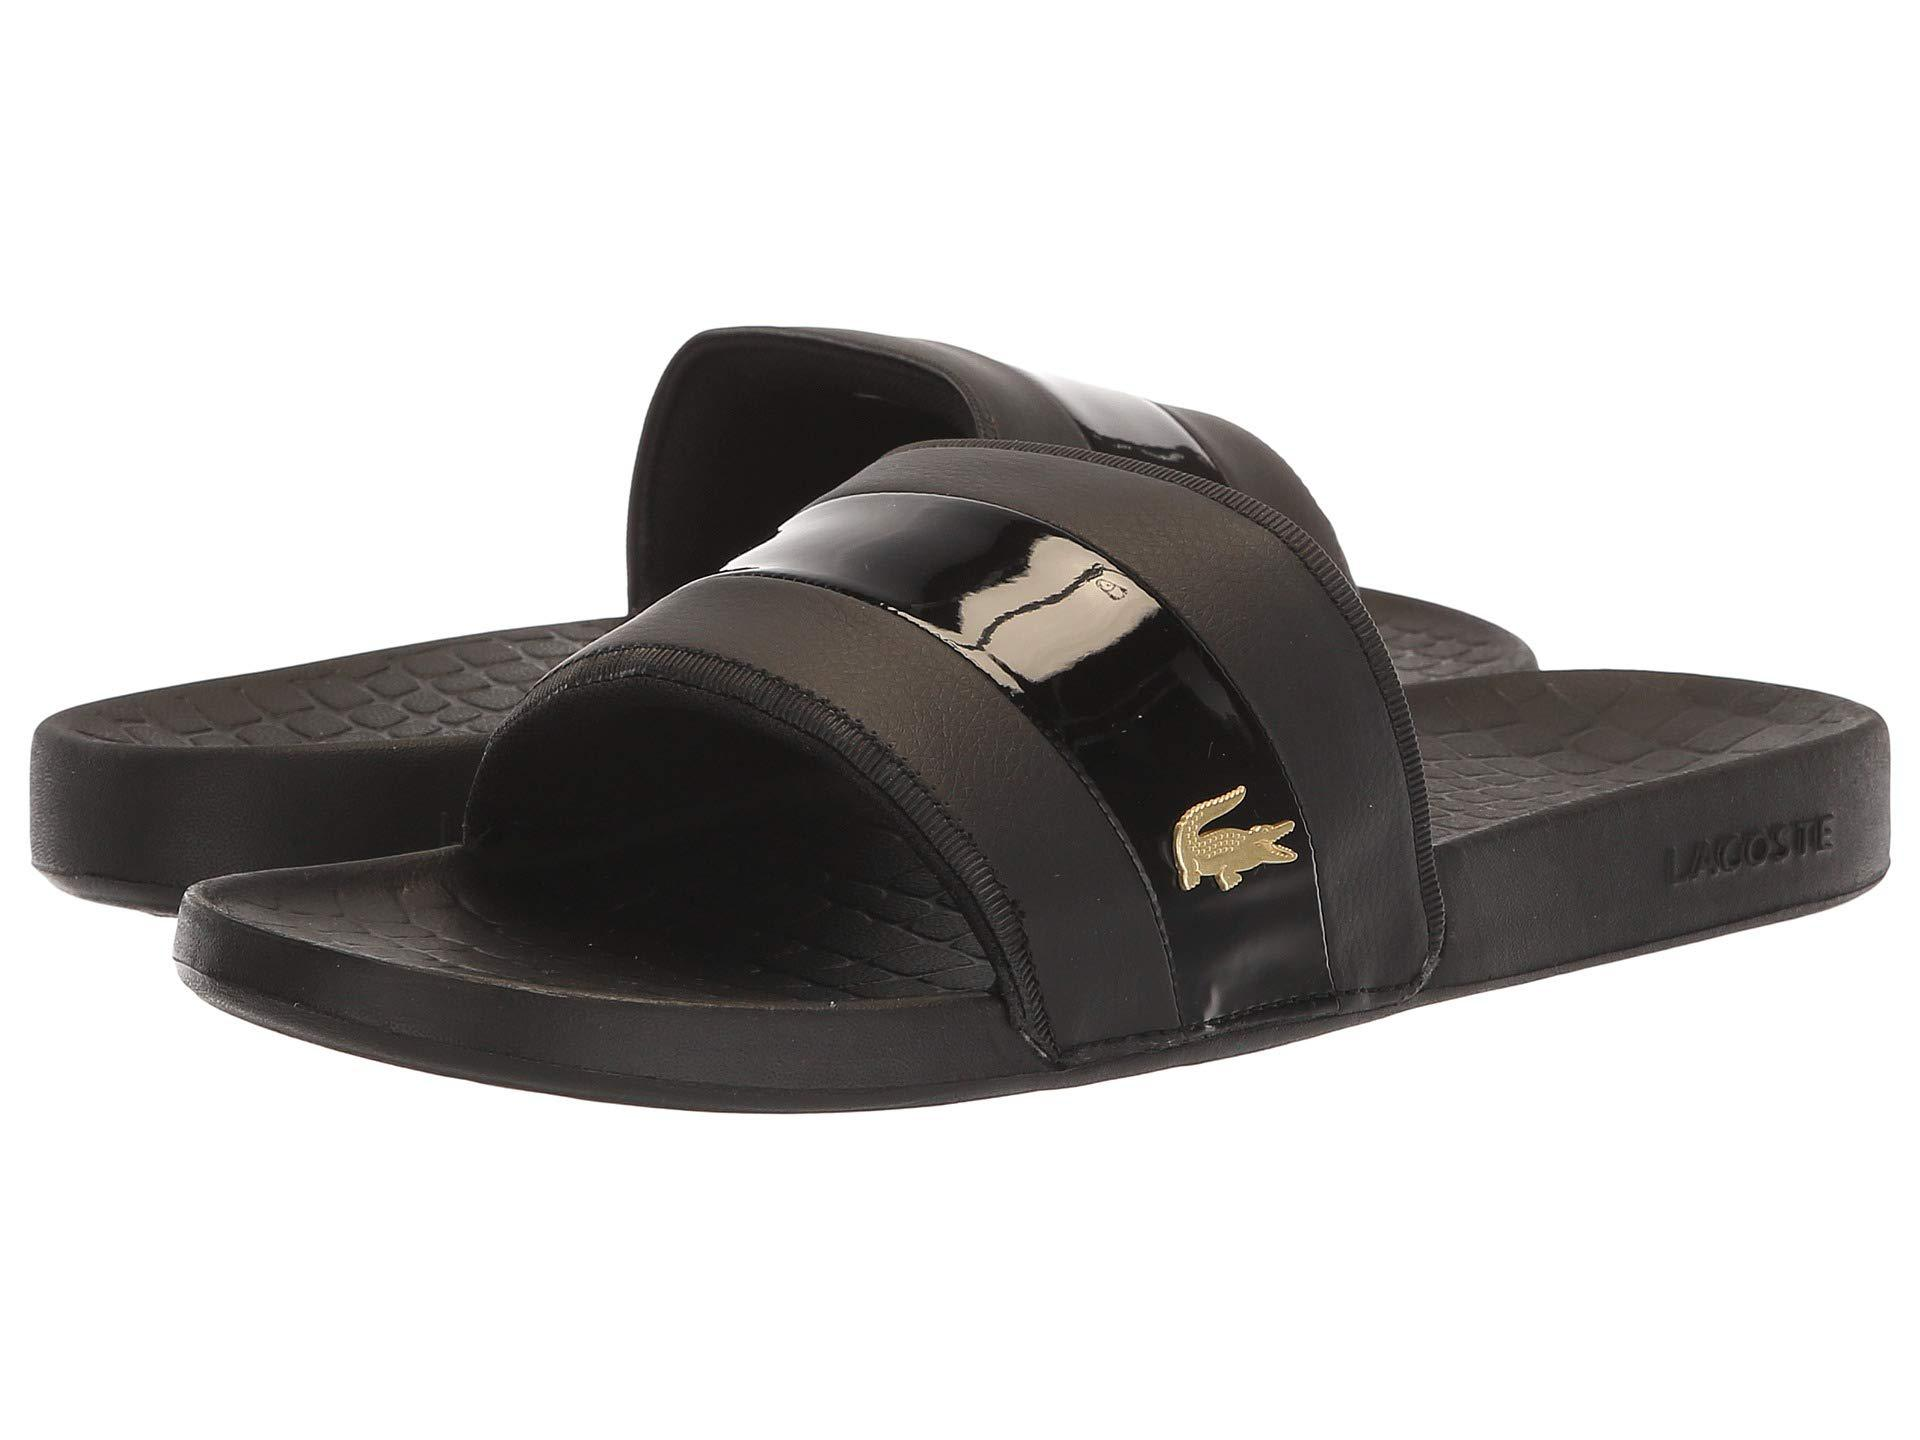 80c8d3cc77e36 Lacoste - Black Fraisier 118 1 U (green gold) Men s Shoes for Men. View  fullscreen